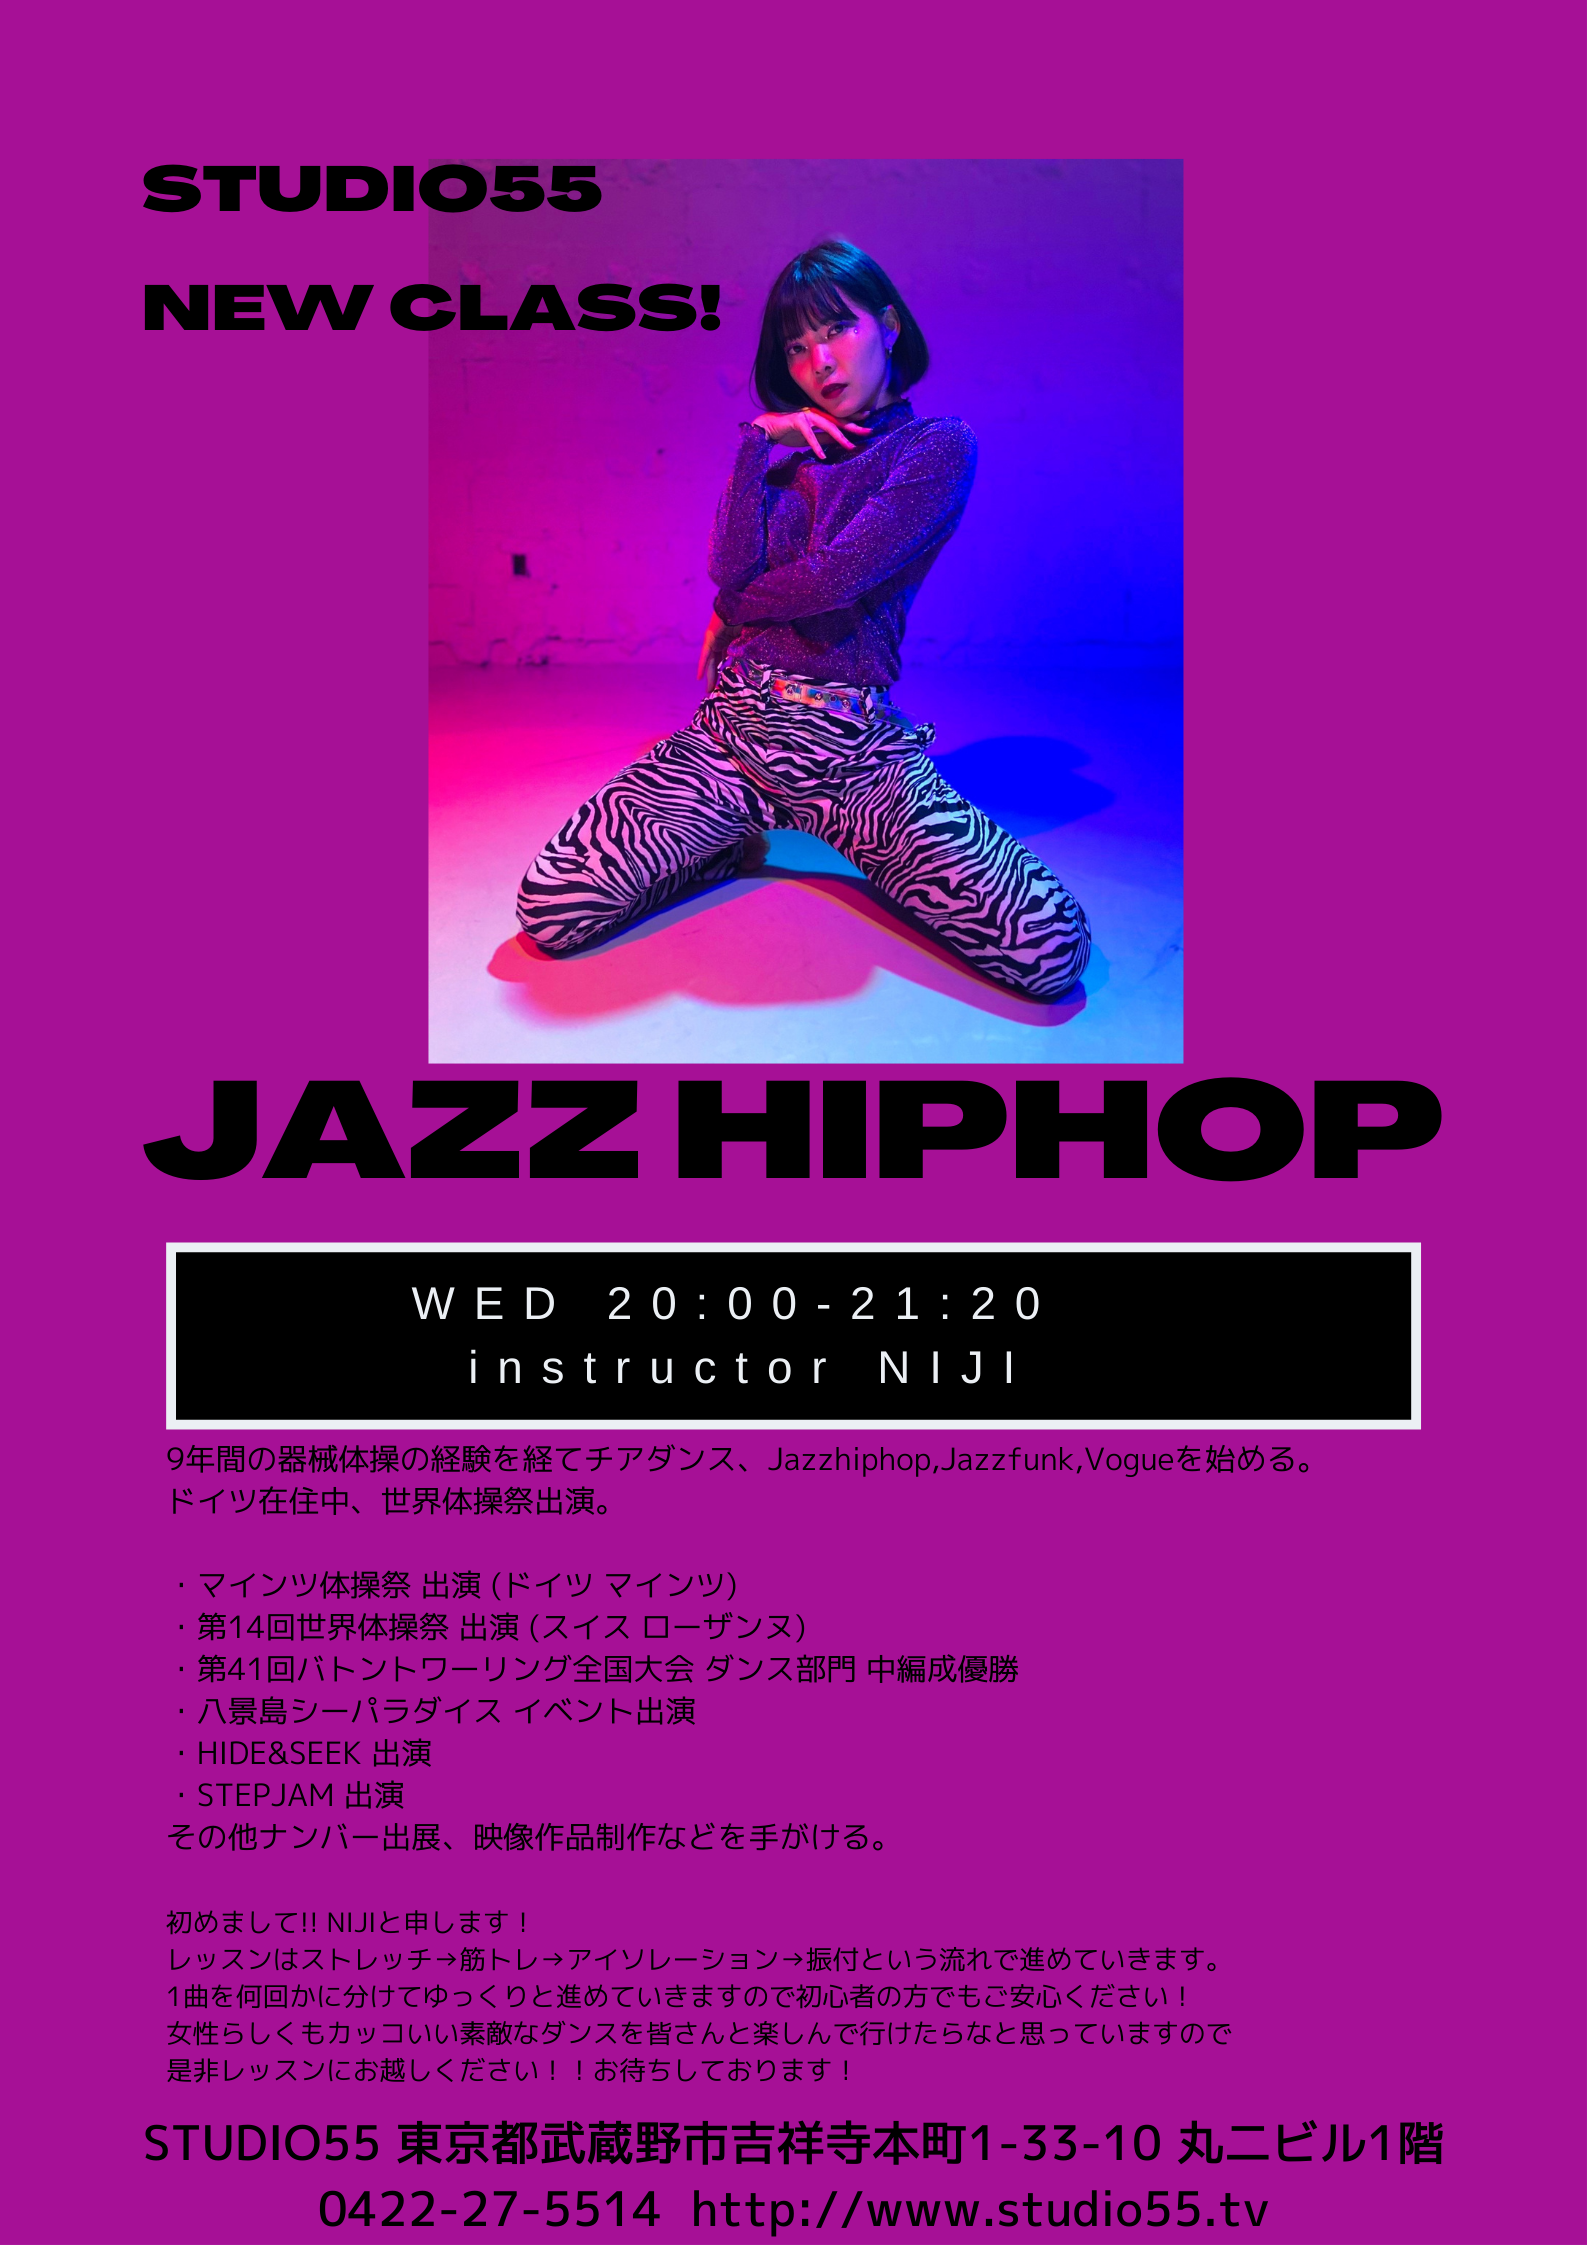 【NEWクラス!水曜日20:00-JAZZHIPHOP】